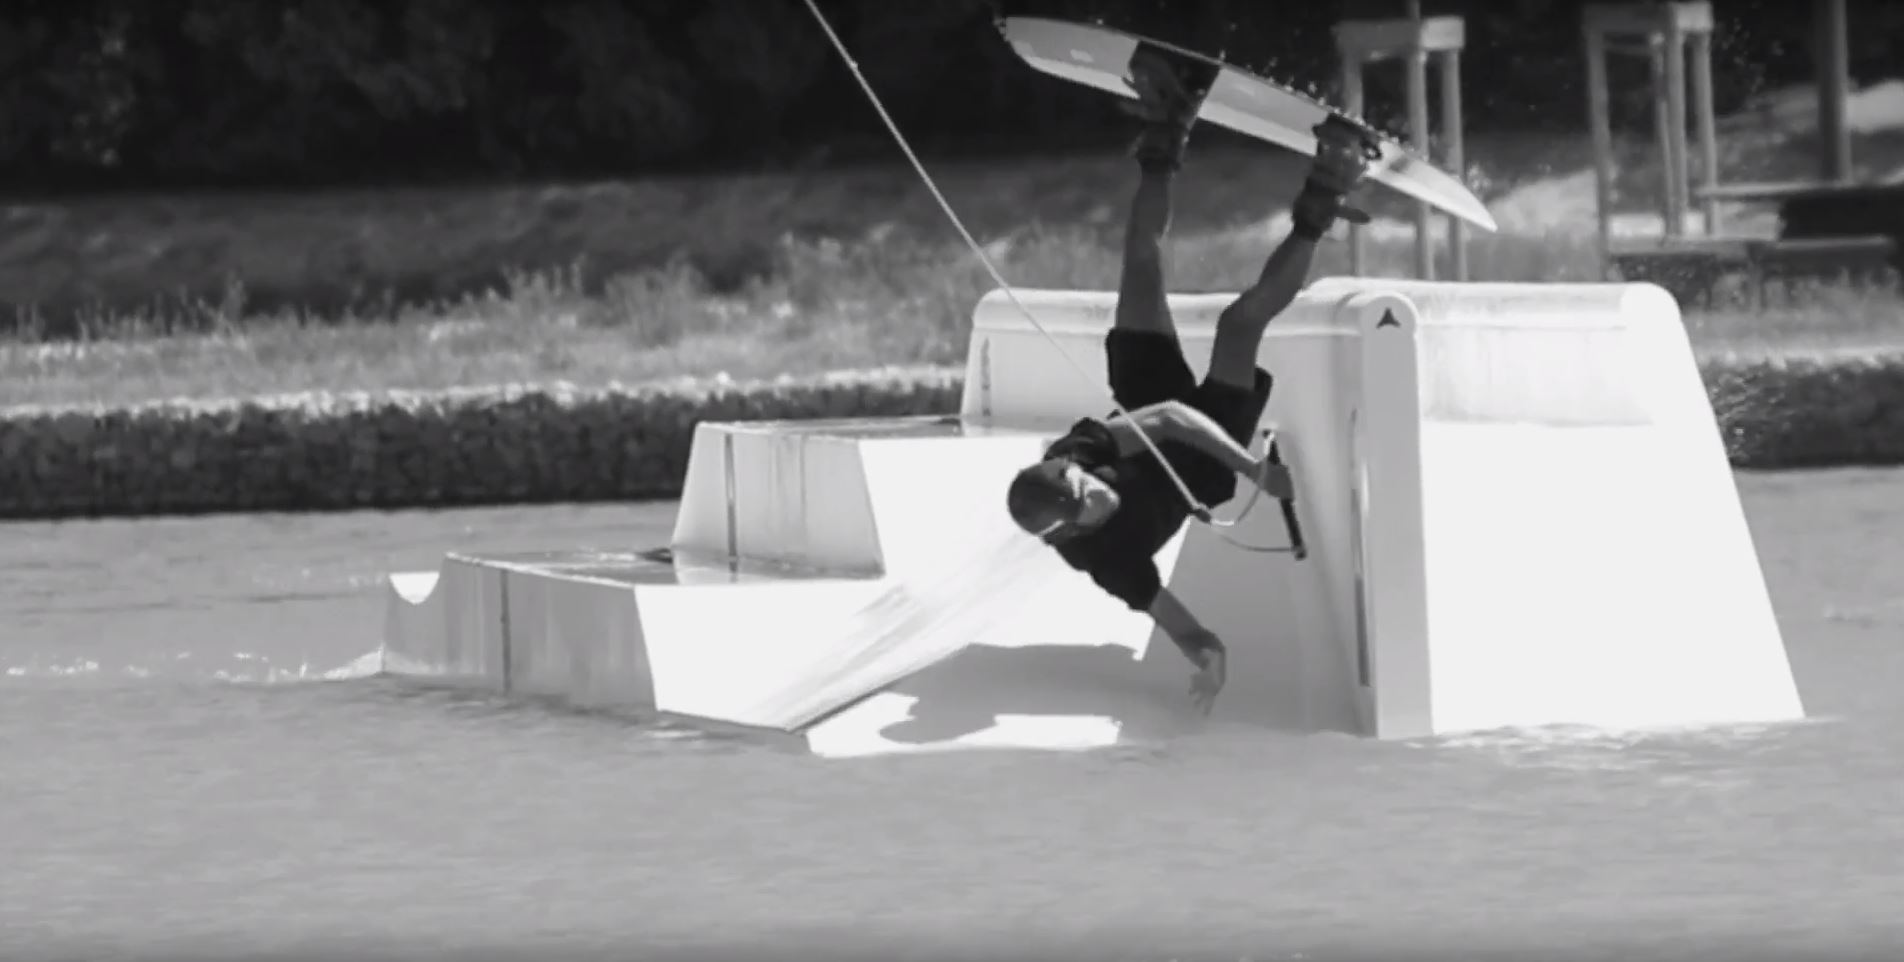 Team Flysurf.com : Thomas Girel